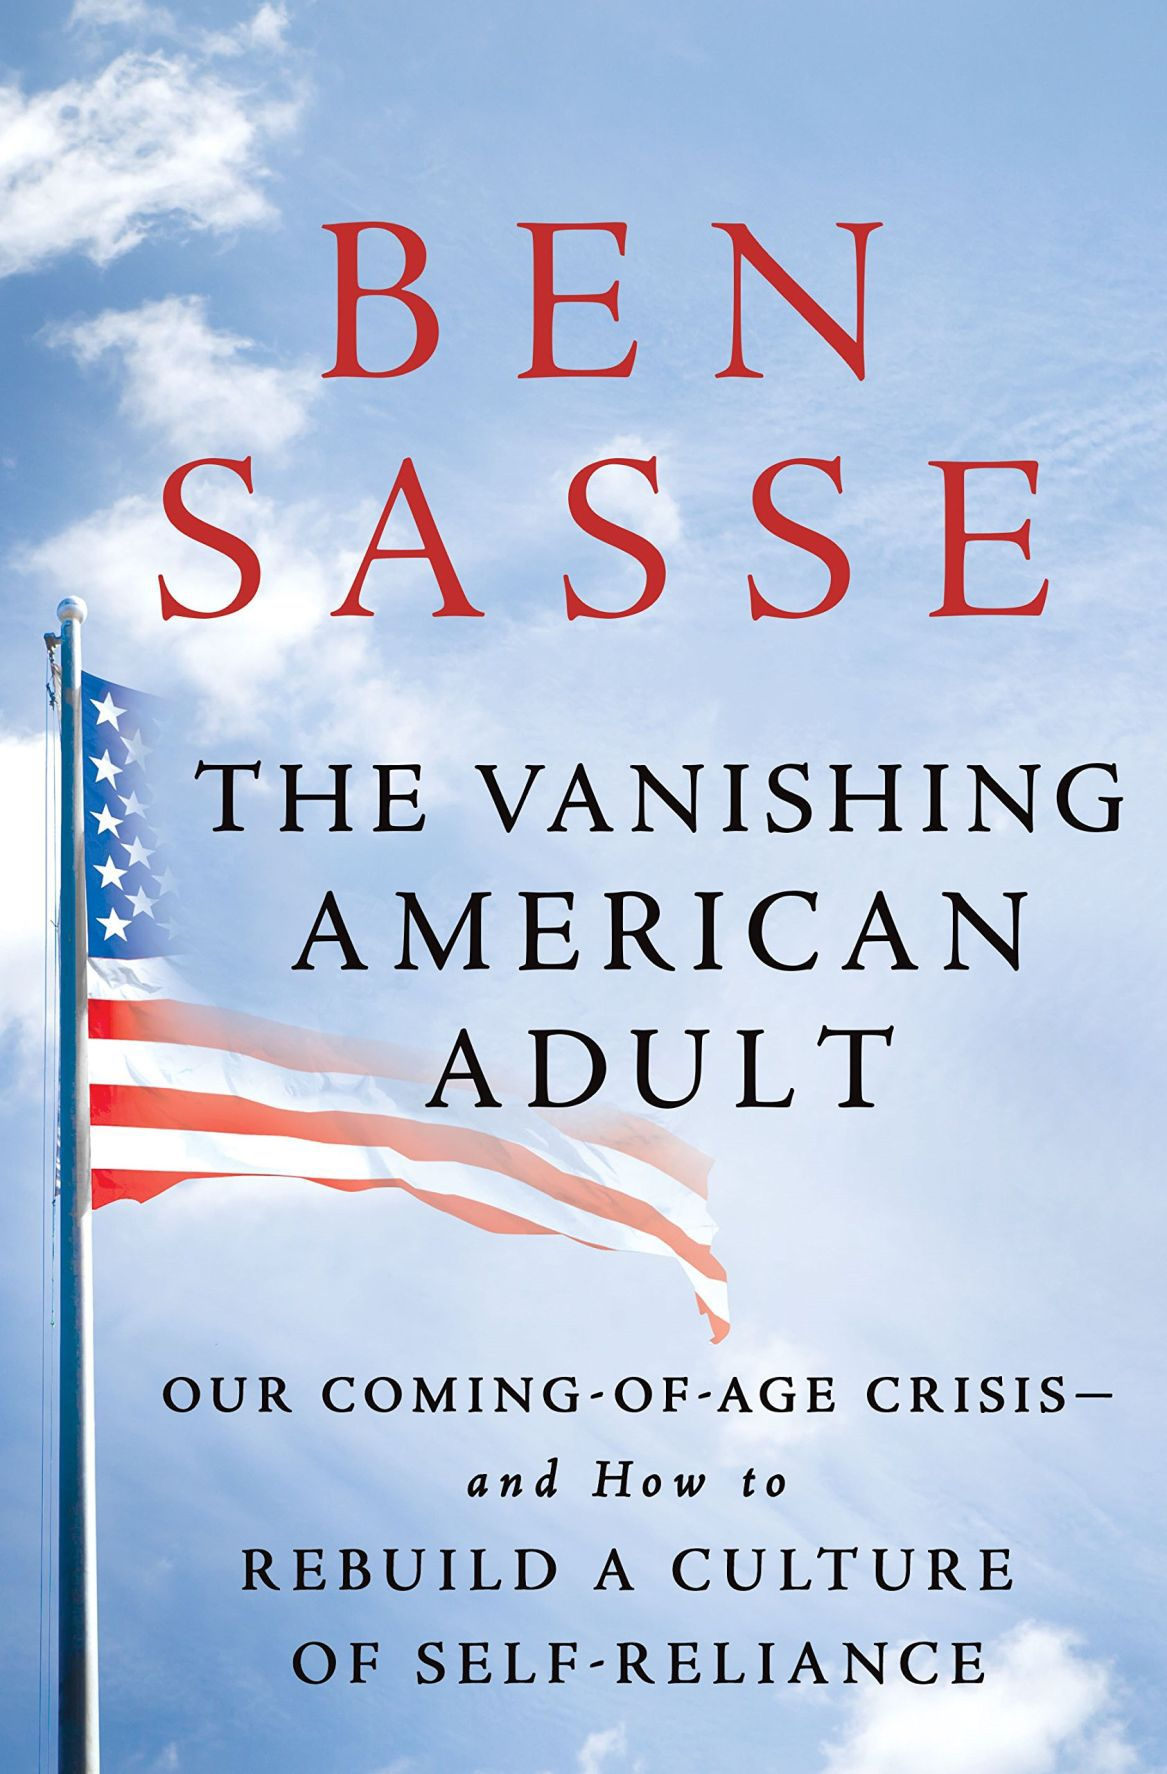 Ben Sasse book cover